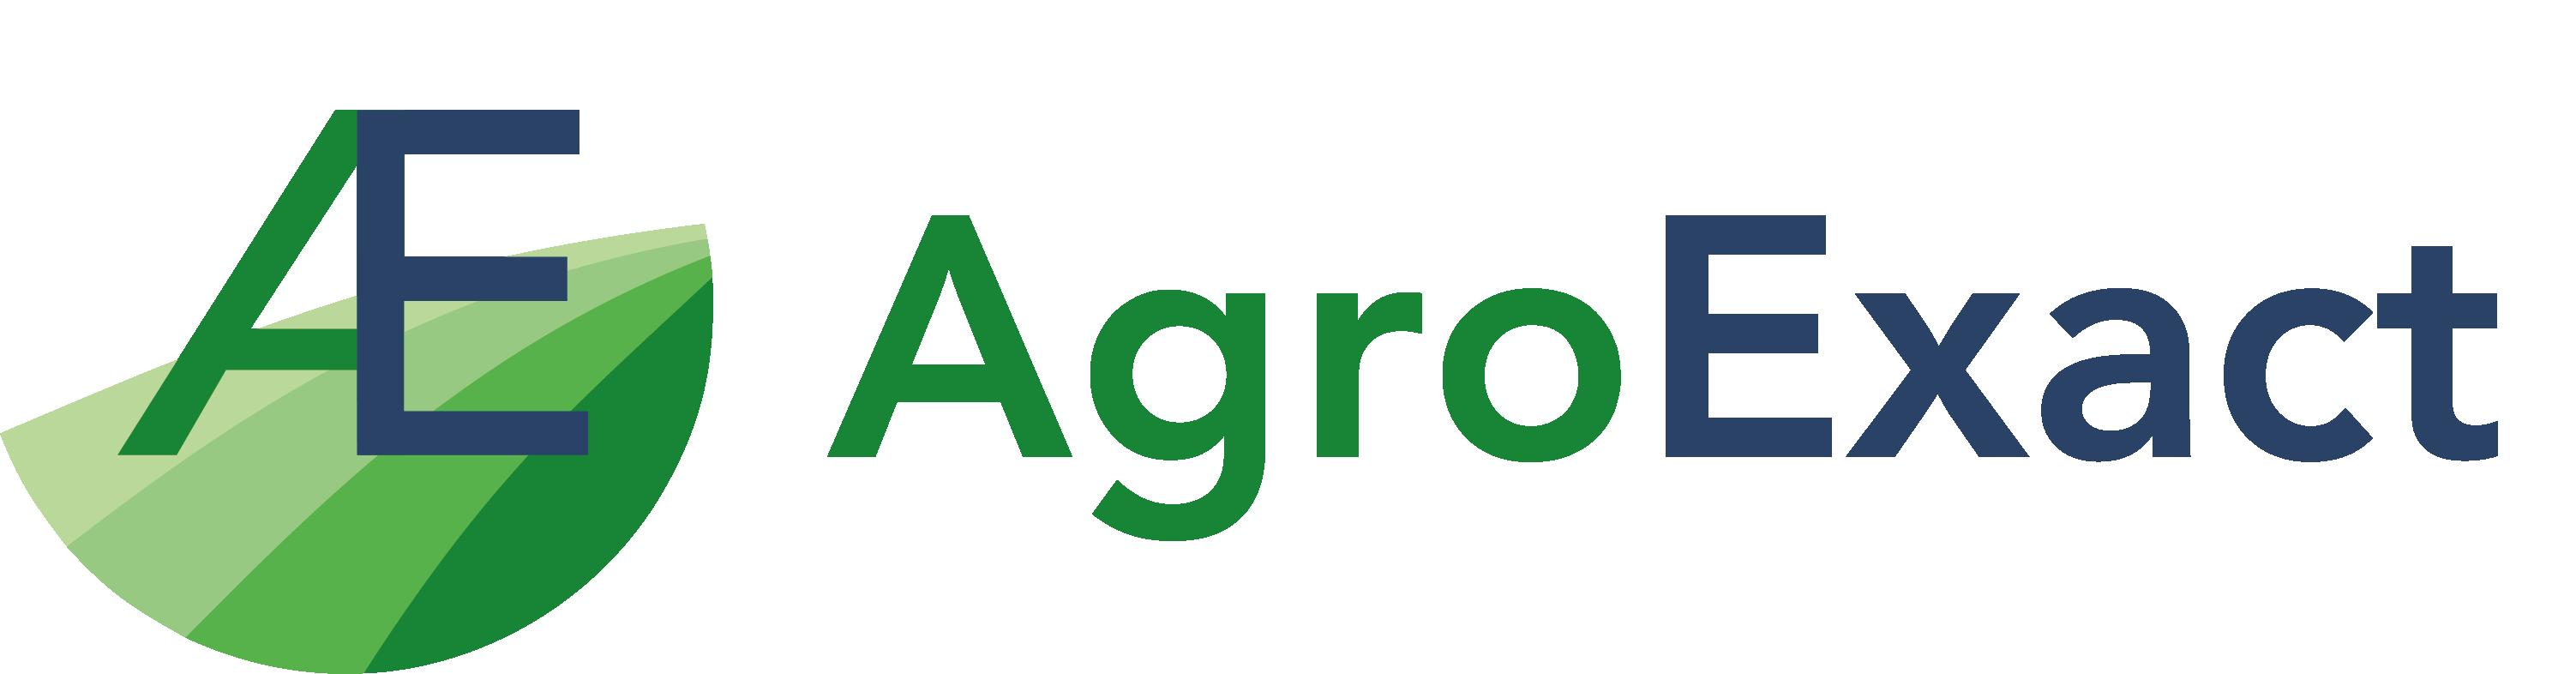 Agroexact-logo-Donkerblauw-1